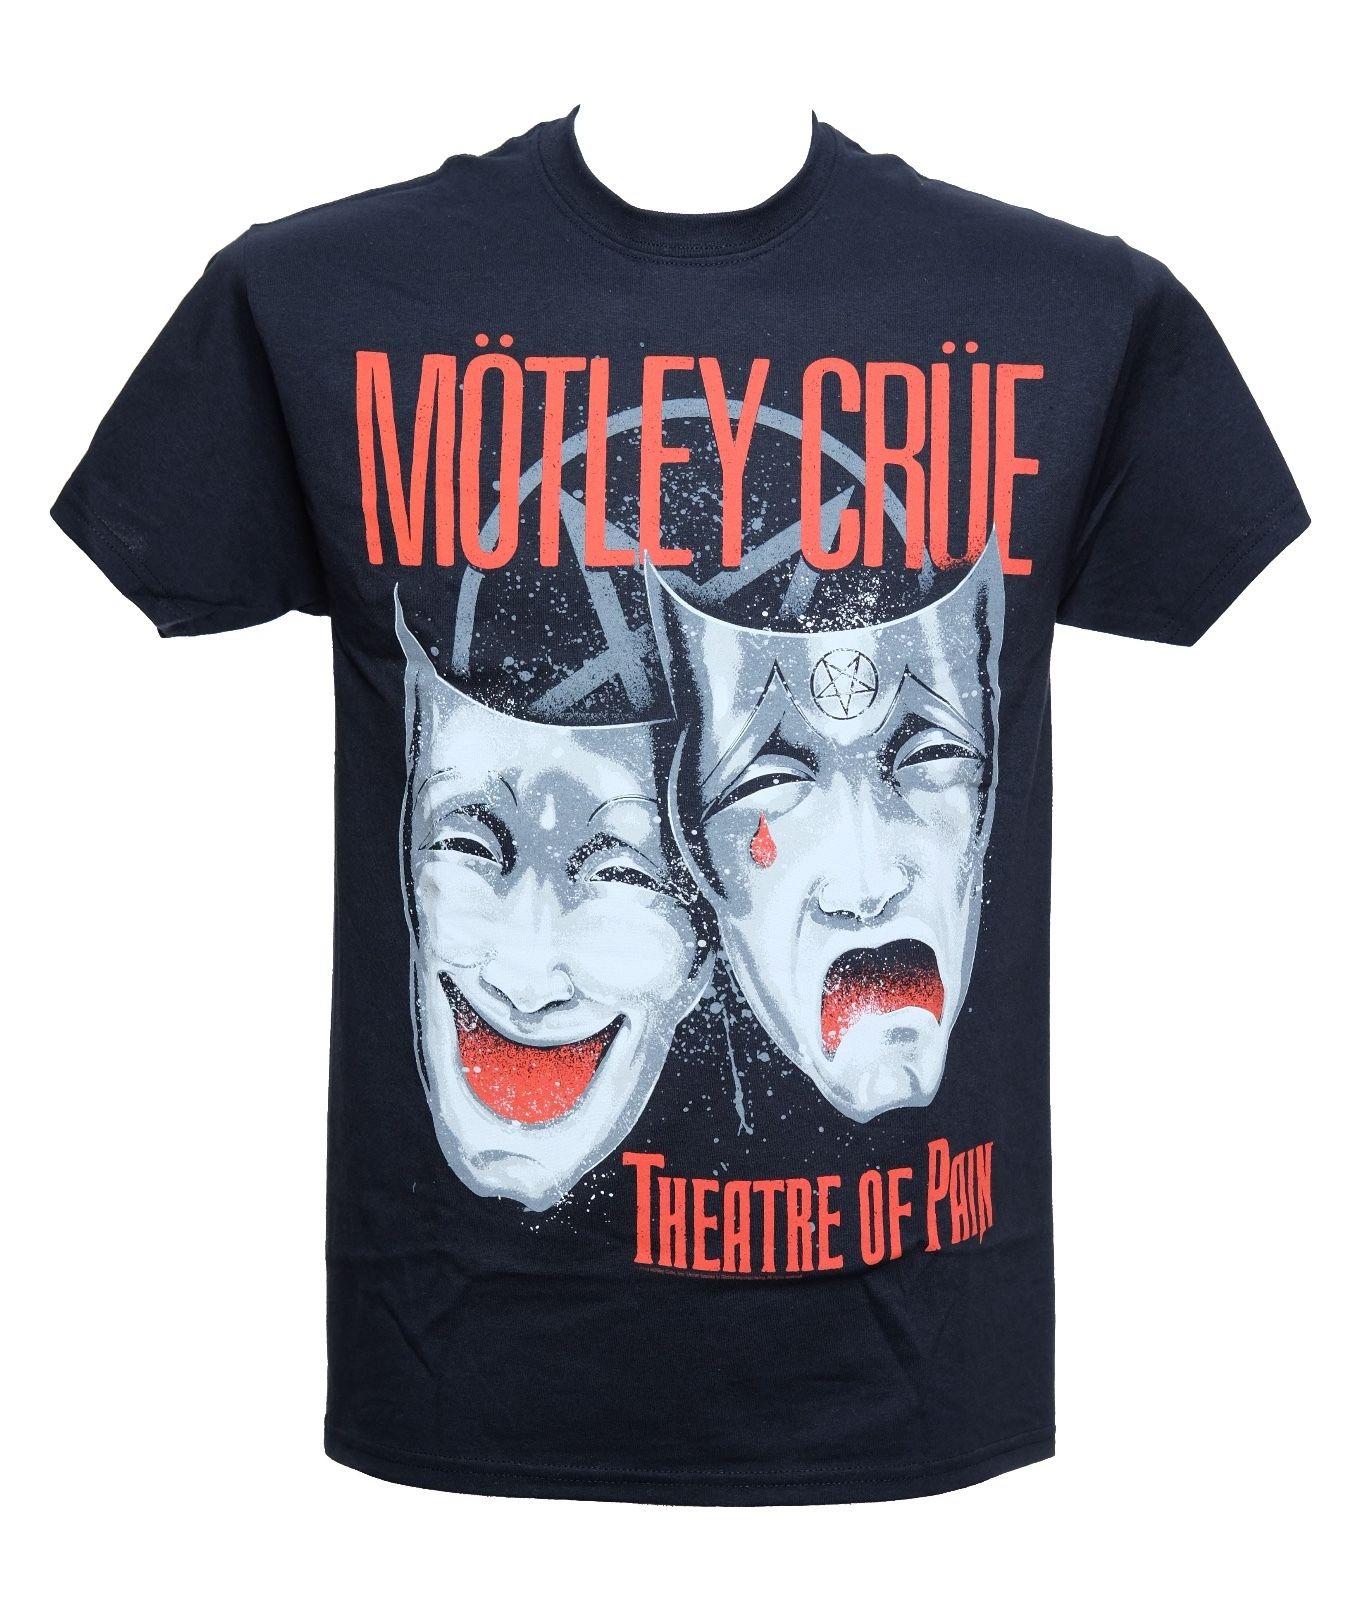 MOTLEY CRUE - THEATRE OF PAIN - Official Licensed T-Shirt - New M L XLShort Sleeve LeisureTop Tee Men T Shirt